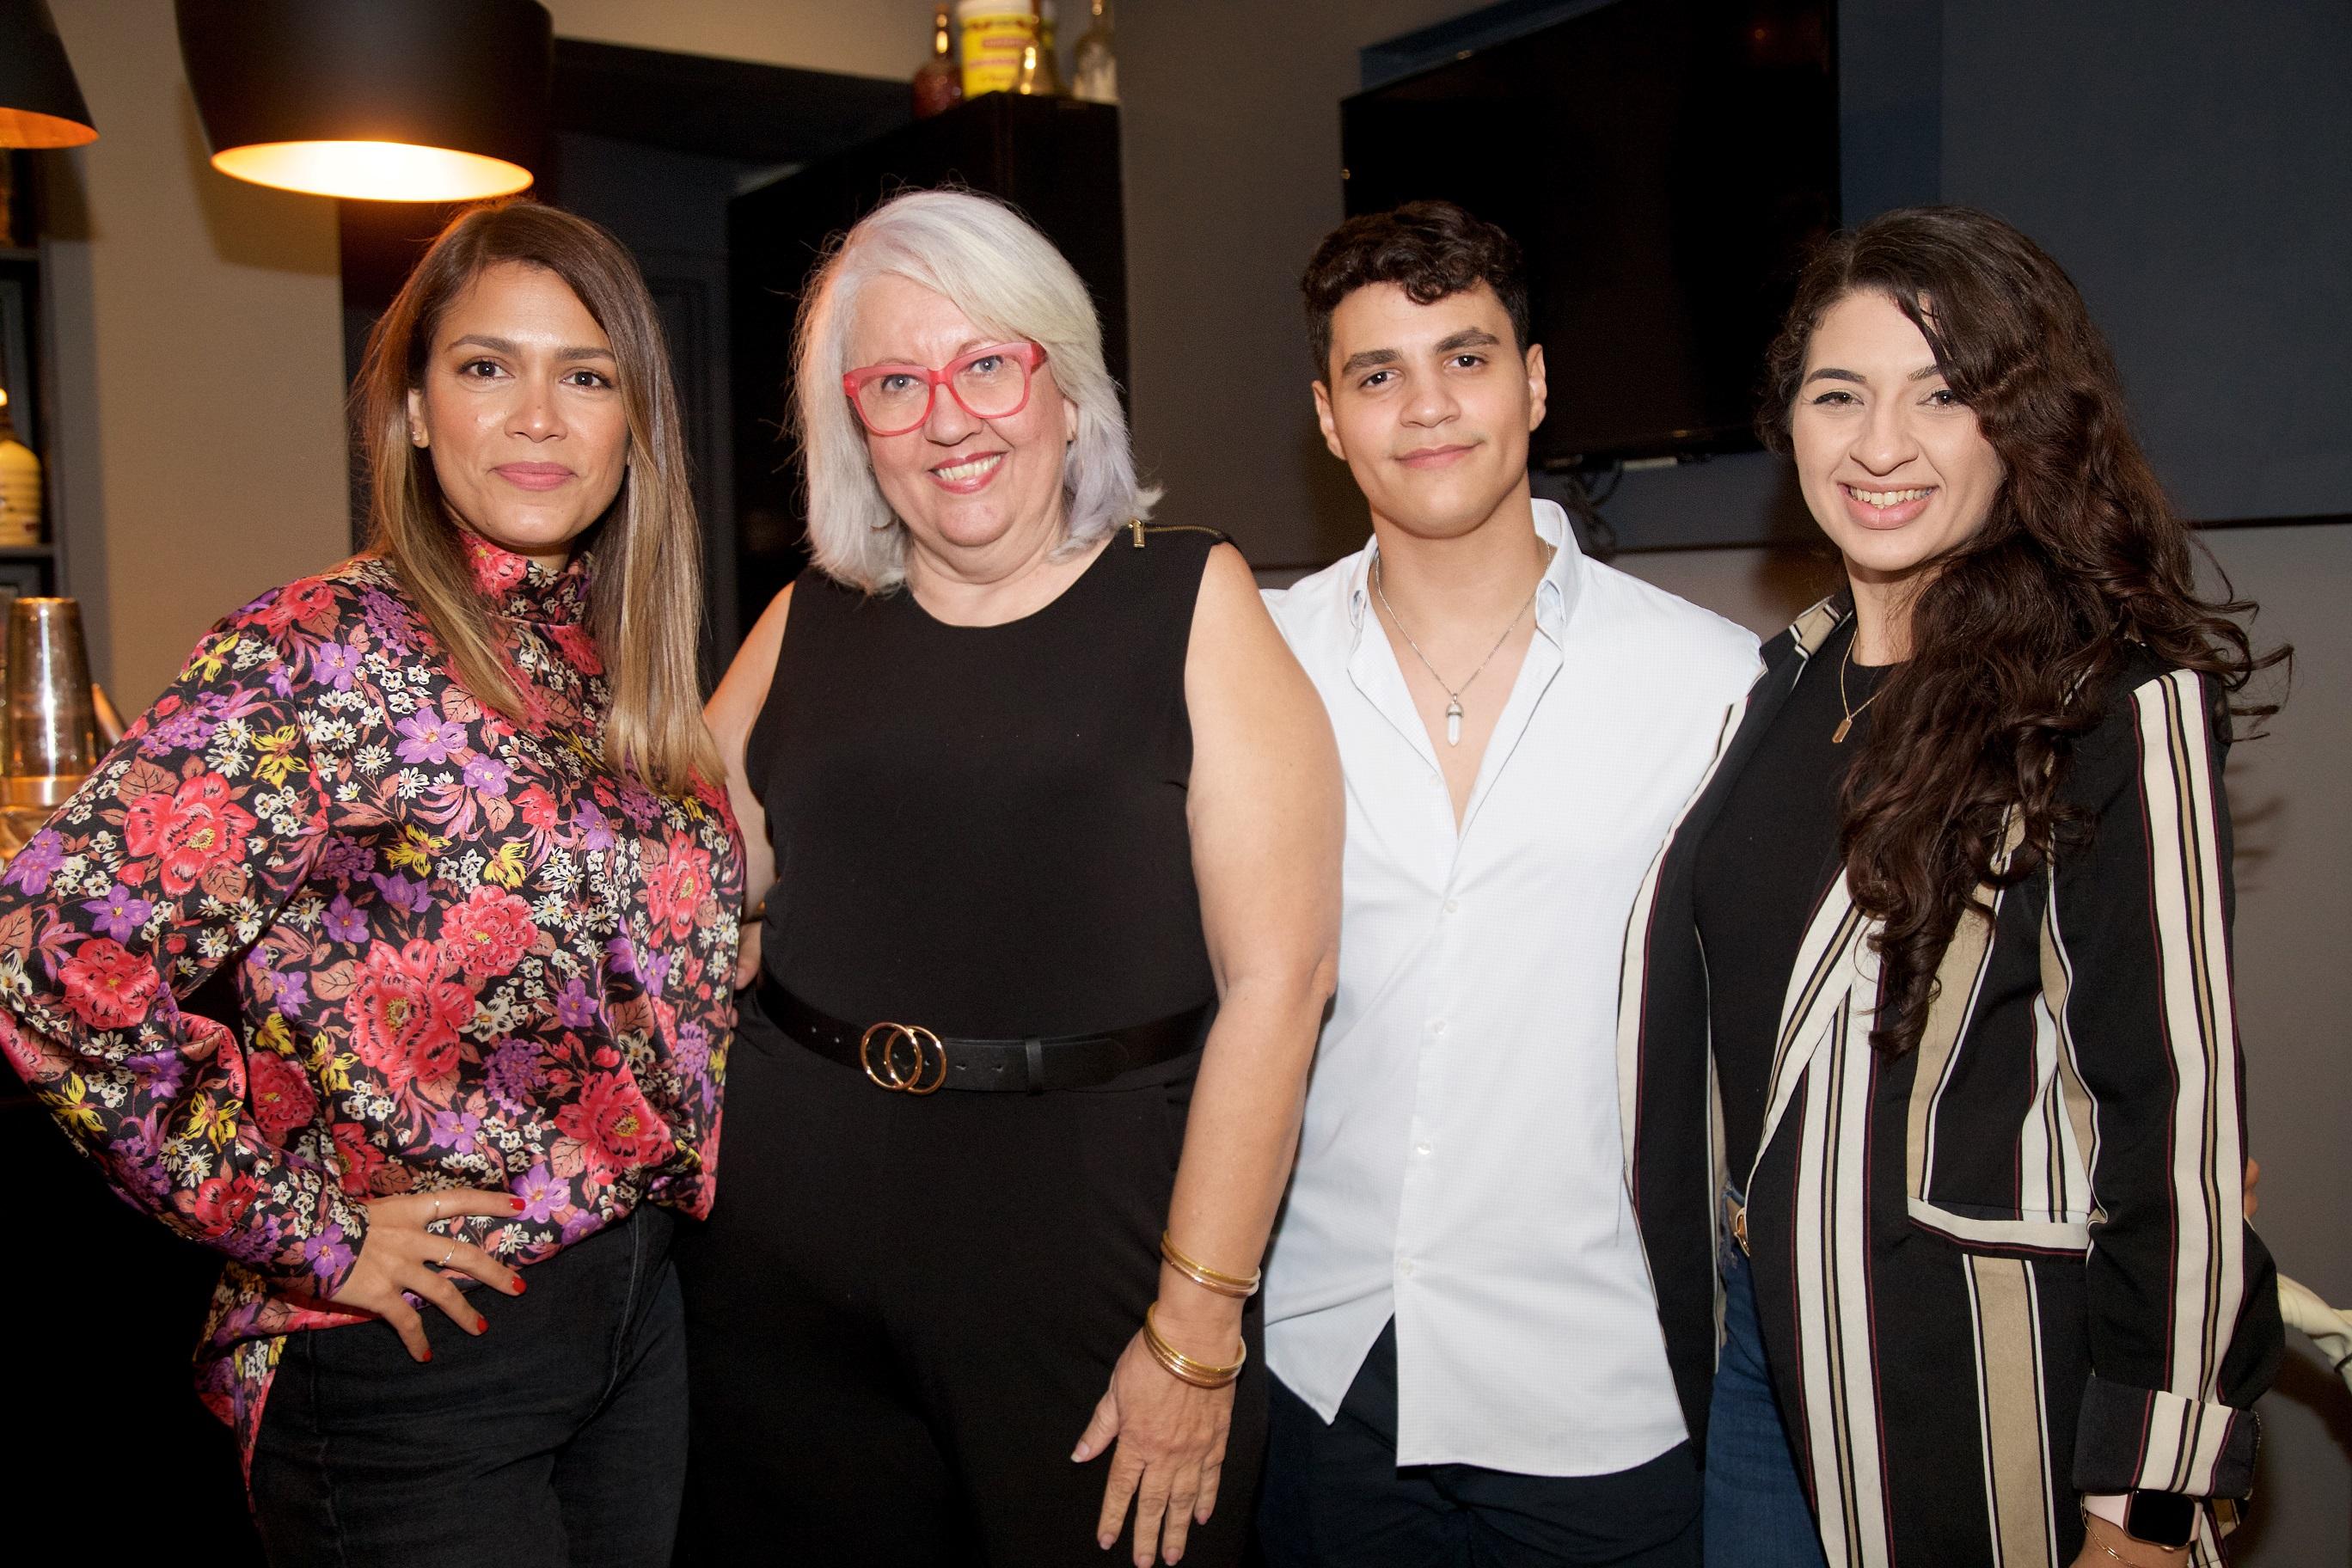 Giselle Cordoves, Idalis Jiménez, Gabriel García y Grinoshka Bou (Nichole Saldarriaga)